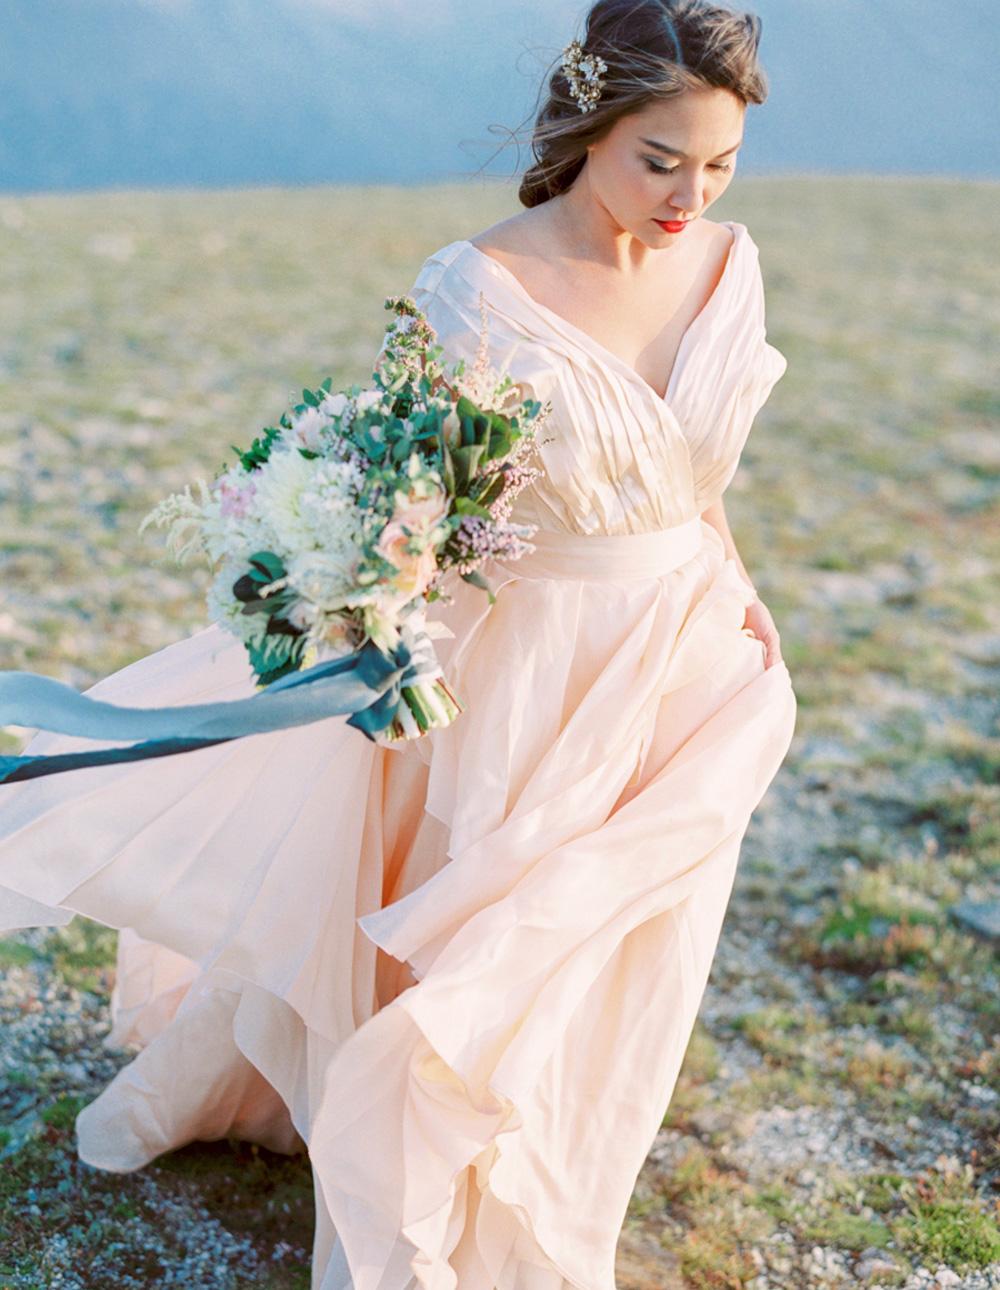 rocky_mountains_wedding_film_photographer.jpg